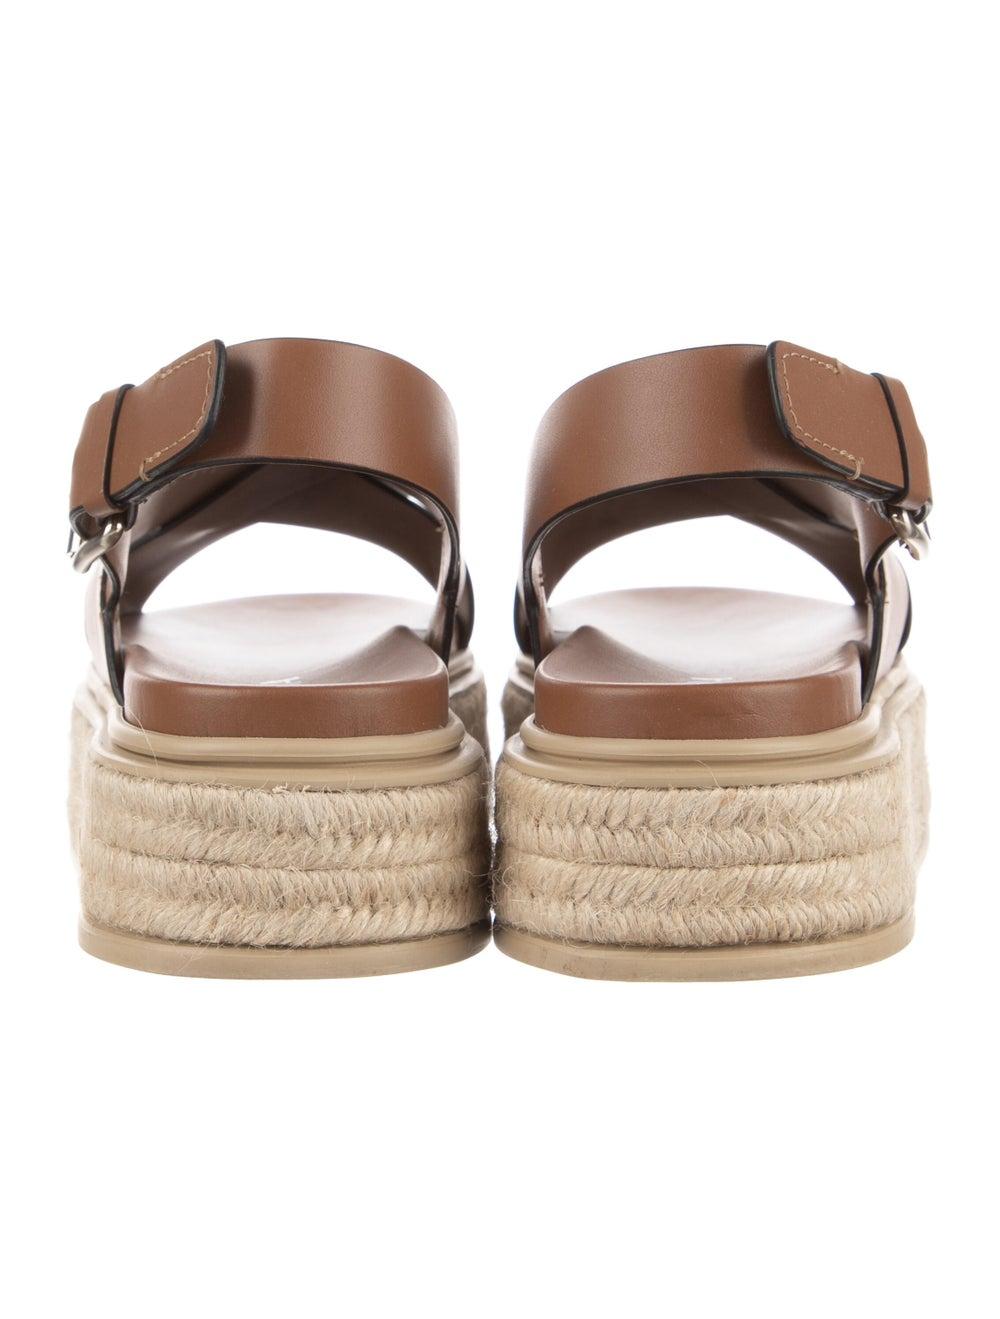 Prada Leather Espadrilles Brown - image 4